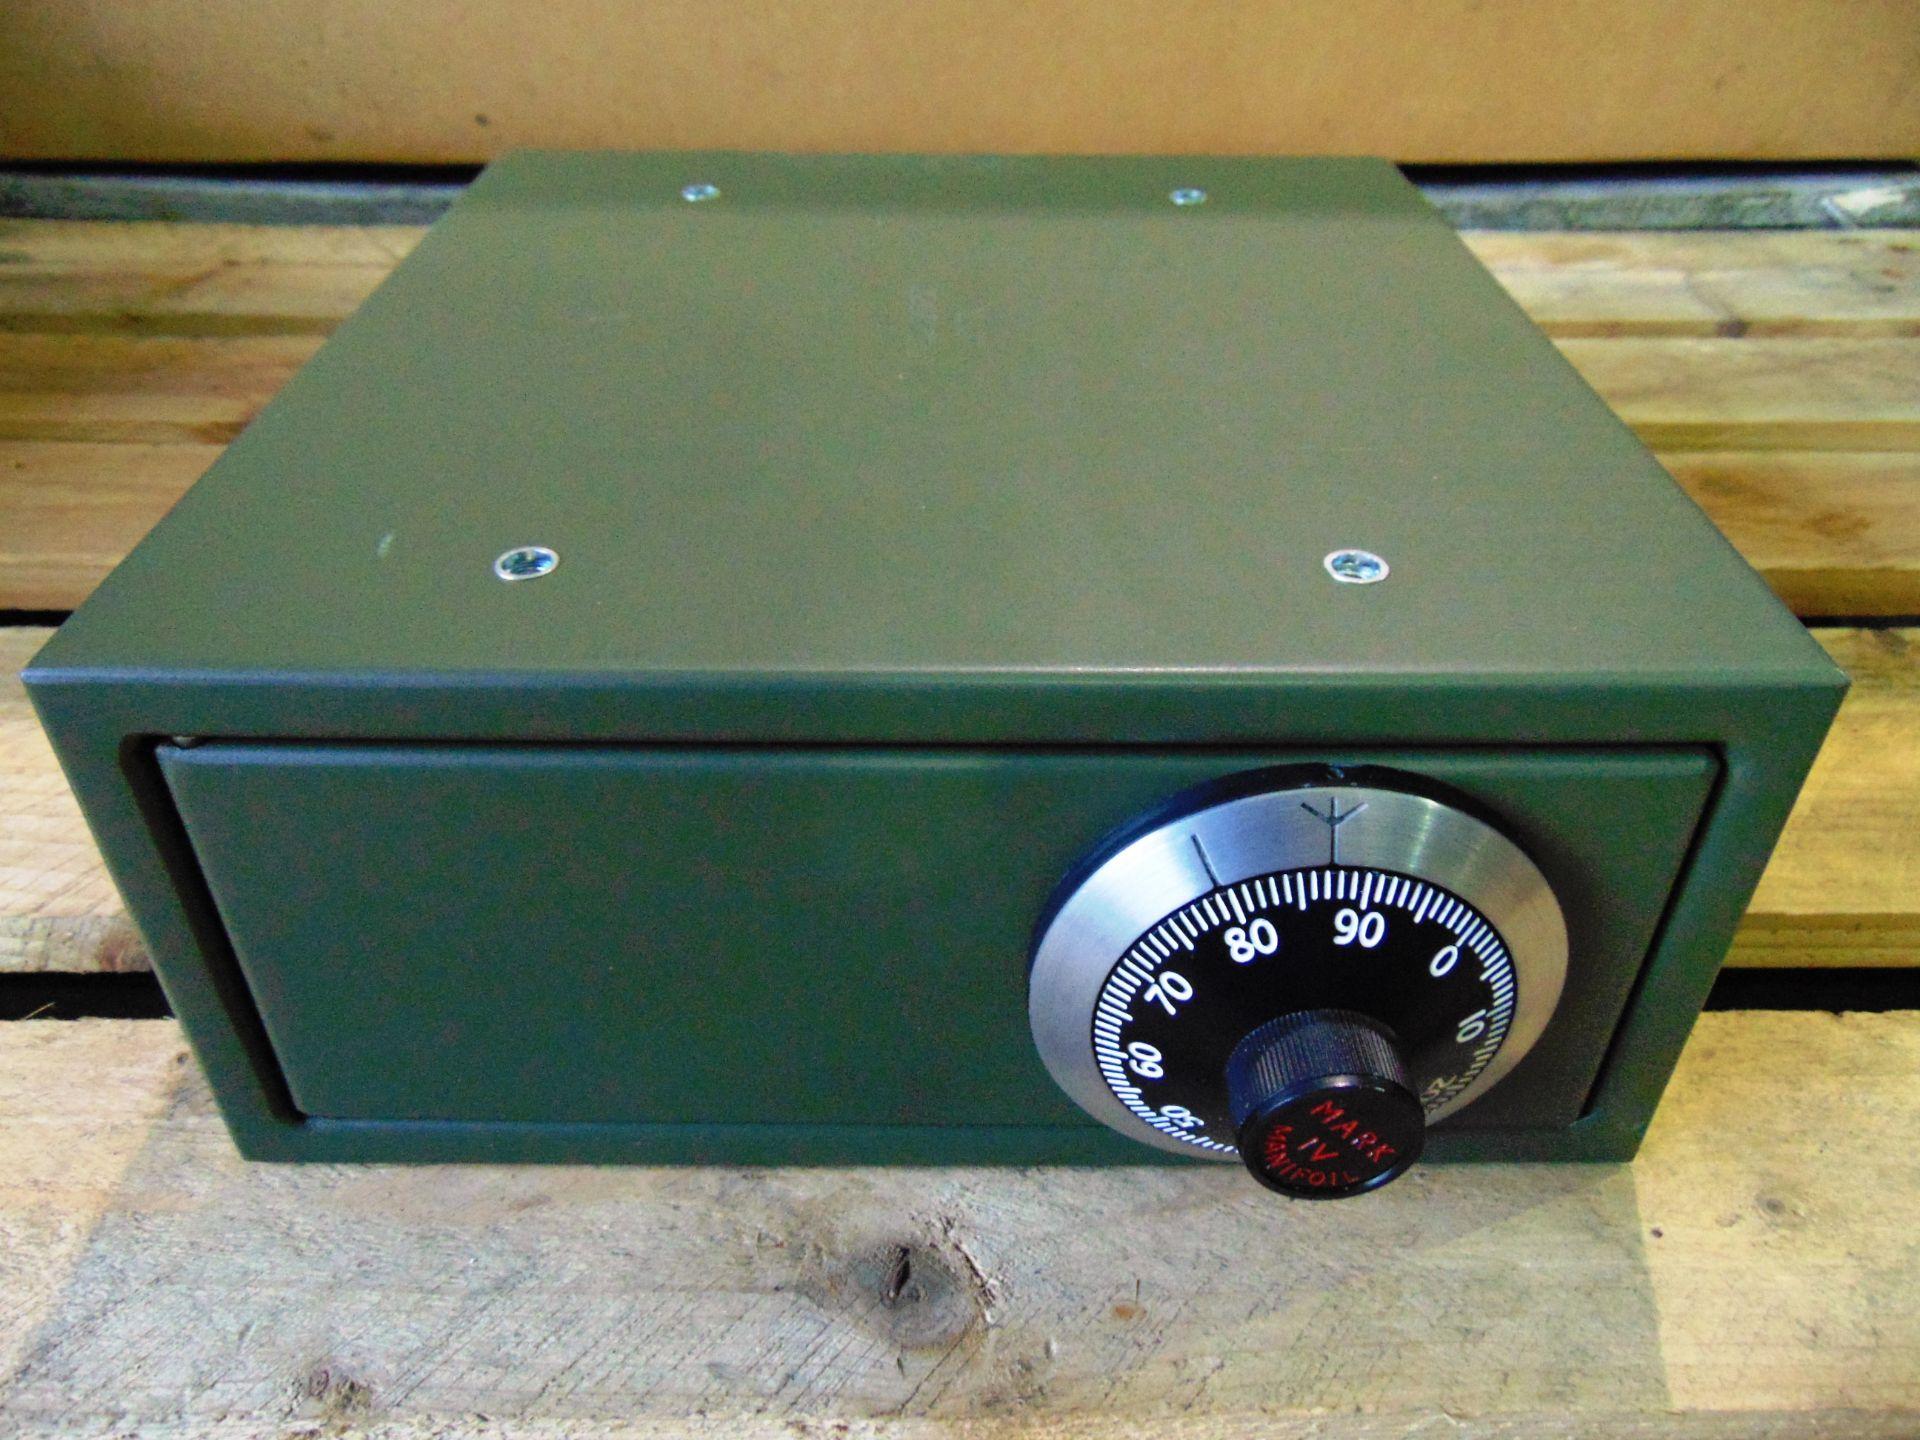 Lot 26831 - Unissued Combination Safe